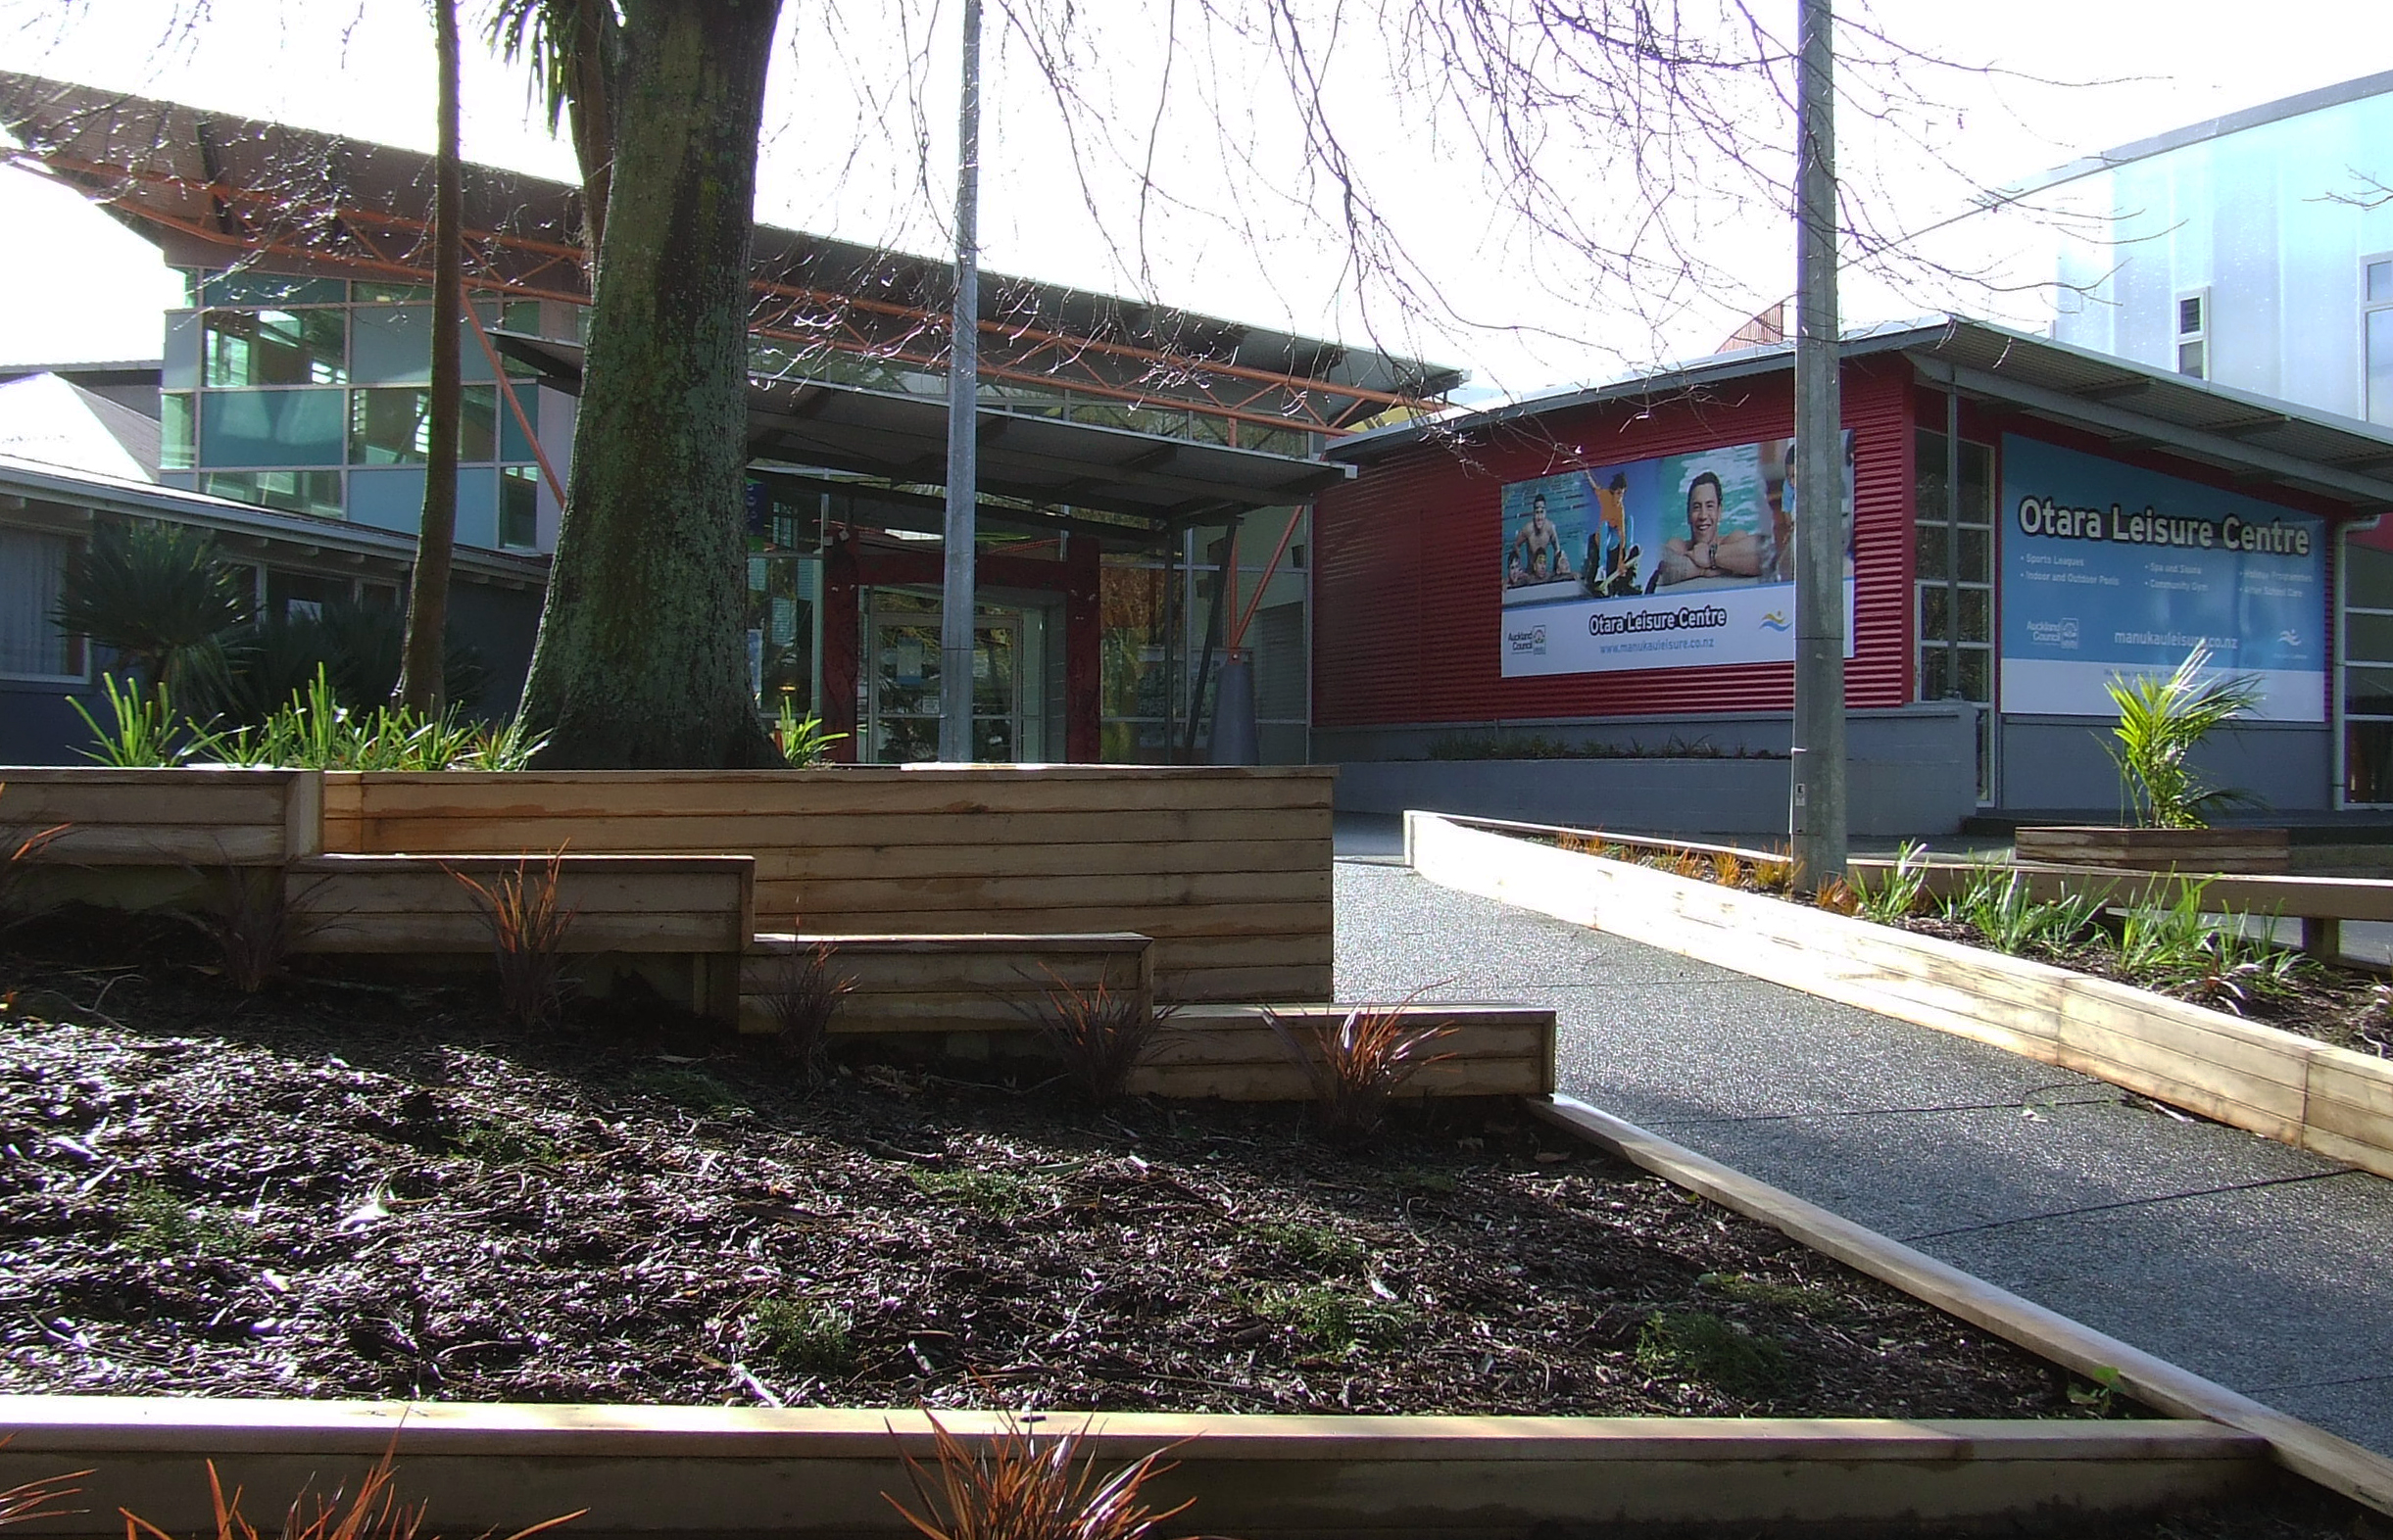 (10) Otara Leisure Centre